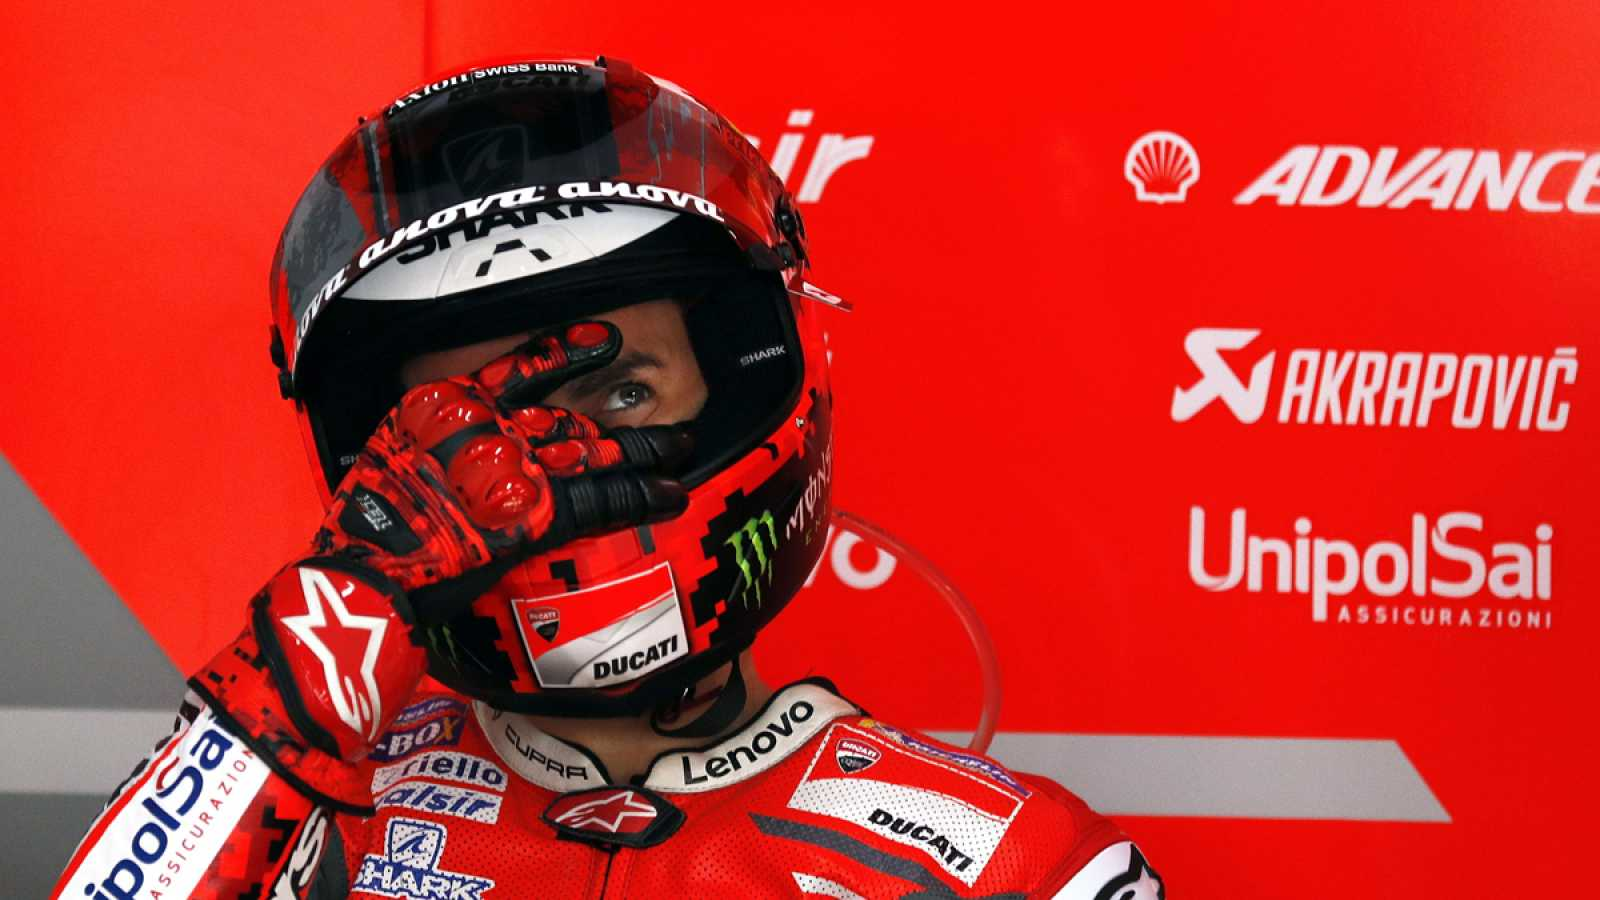 Jorge Lorenzo se prueba y decide no disputar la carrera japonesa